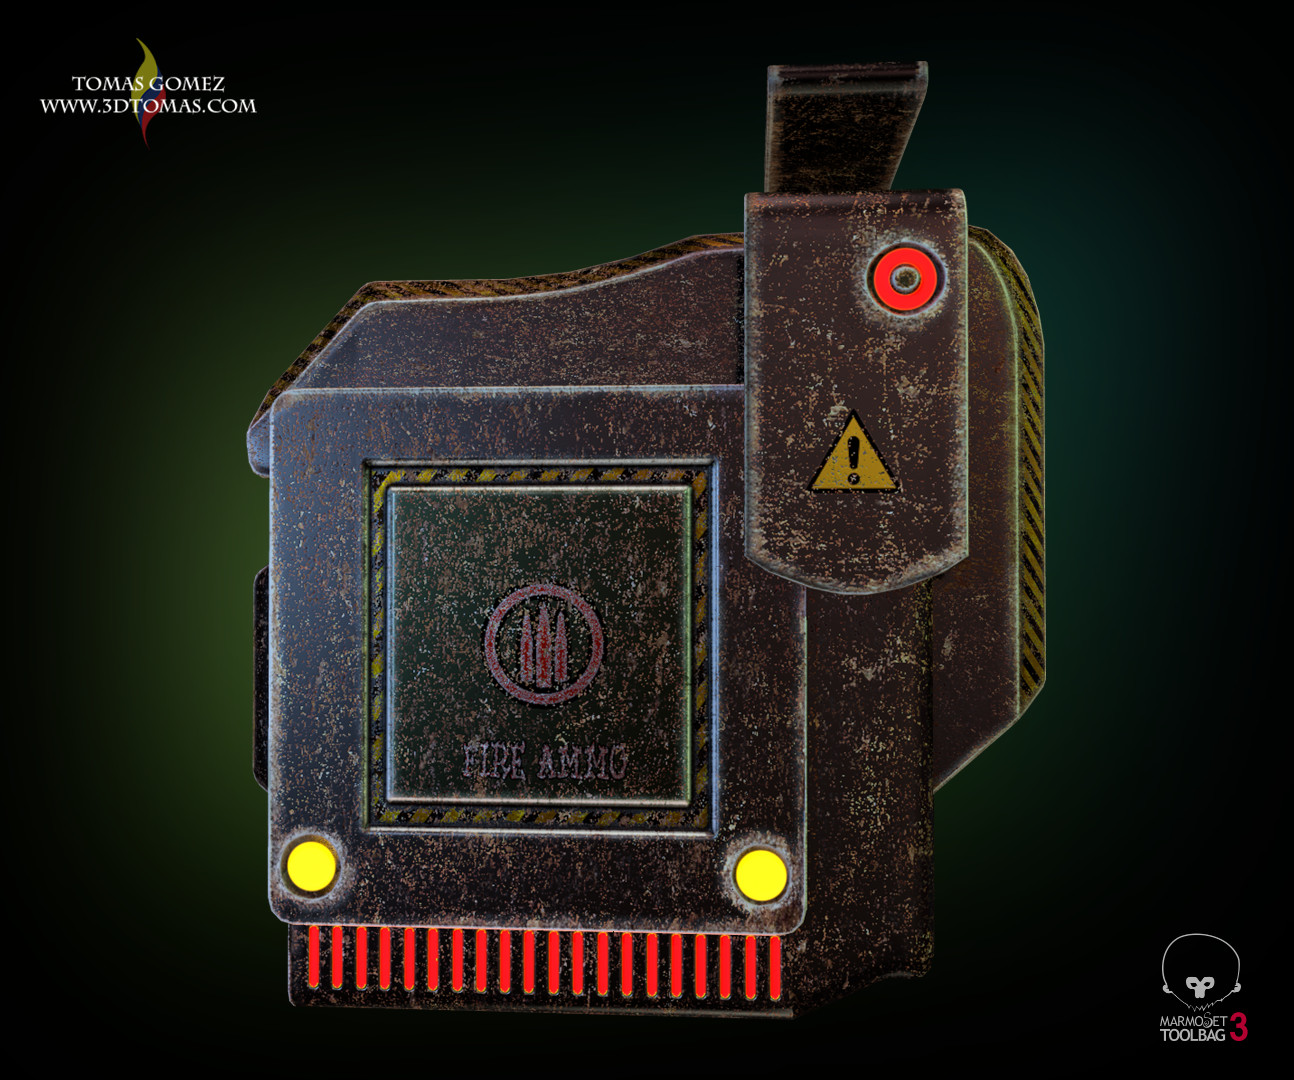 Tomas gomez crate4